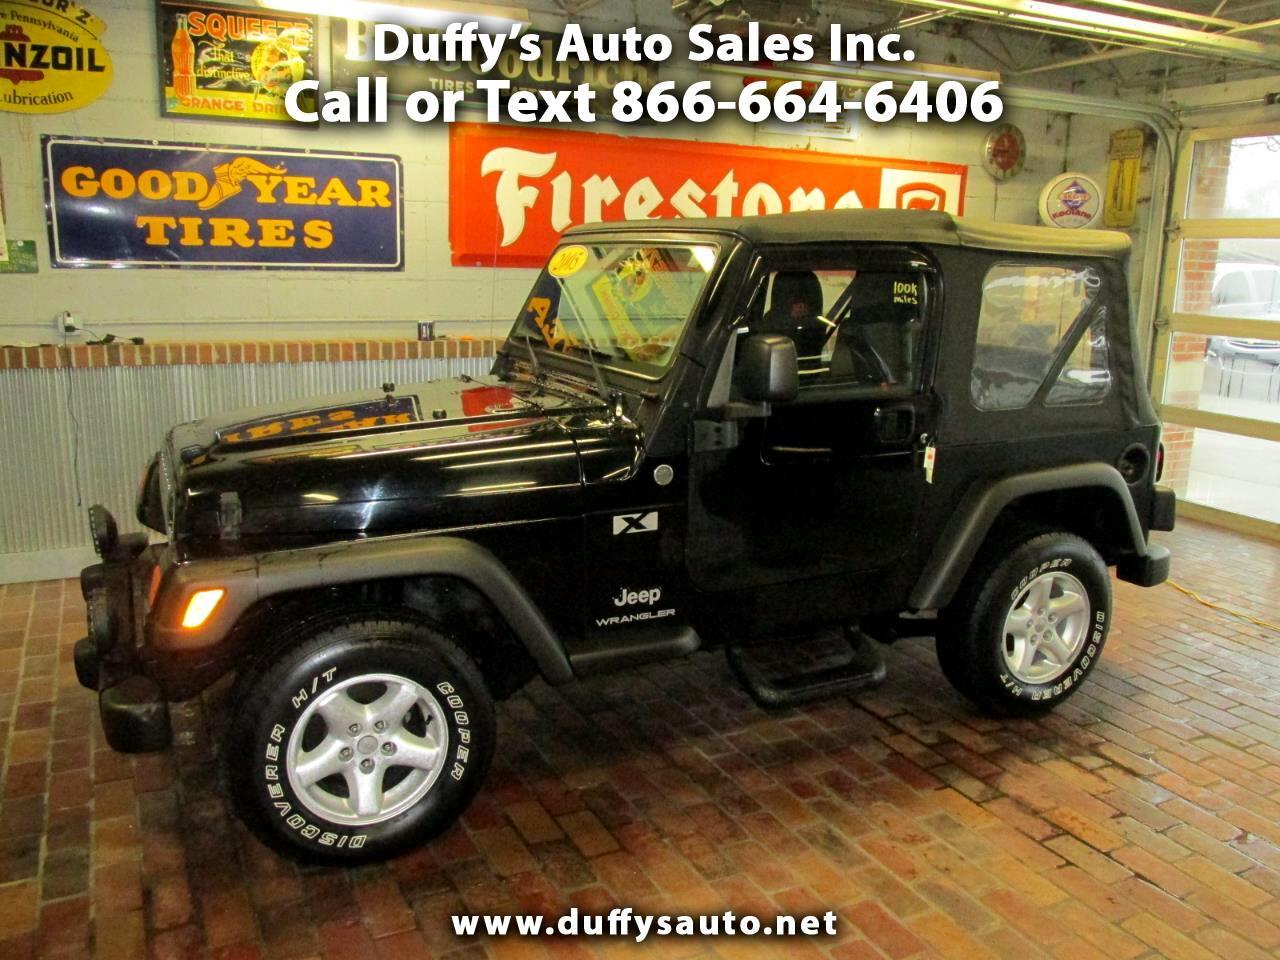 Jeep Wrangler 2dr X 2005